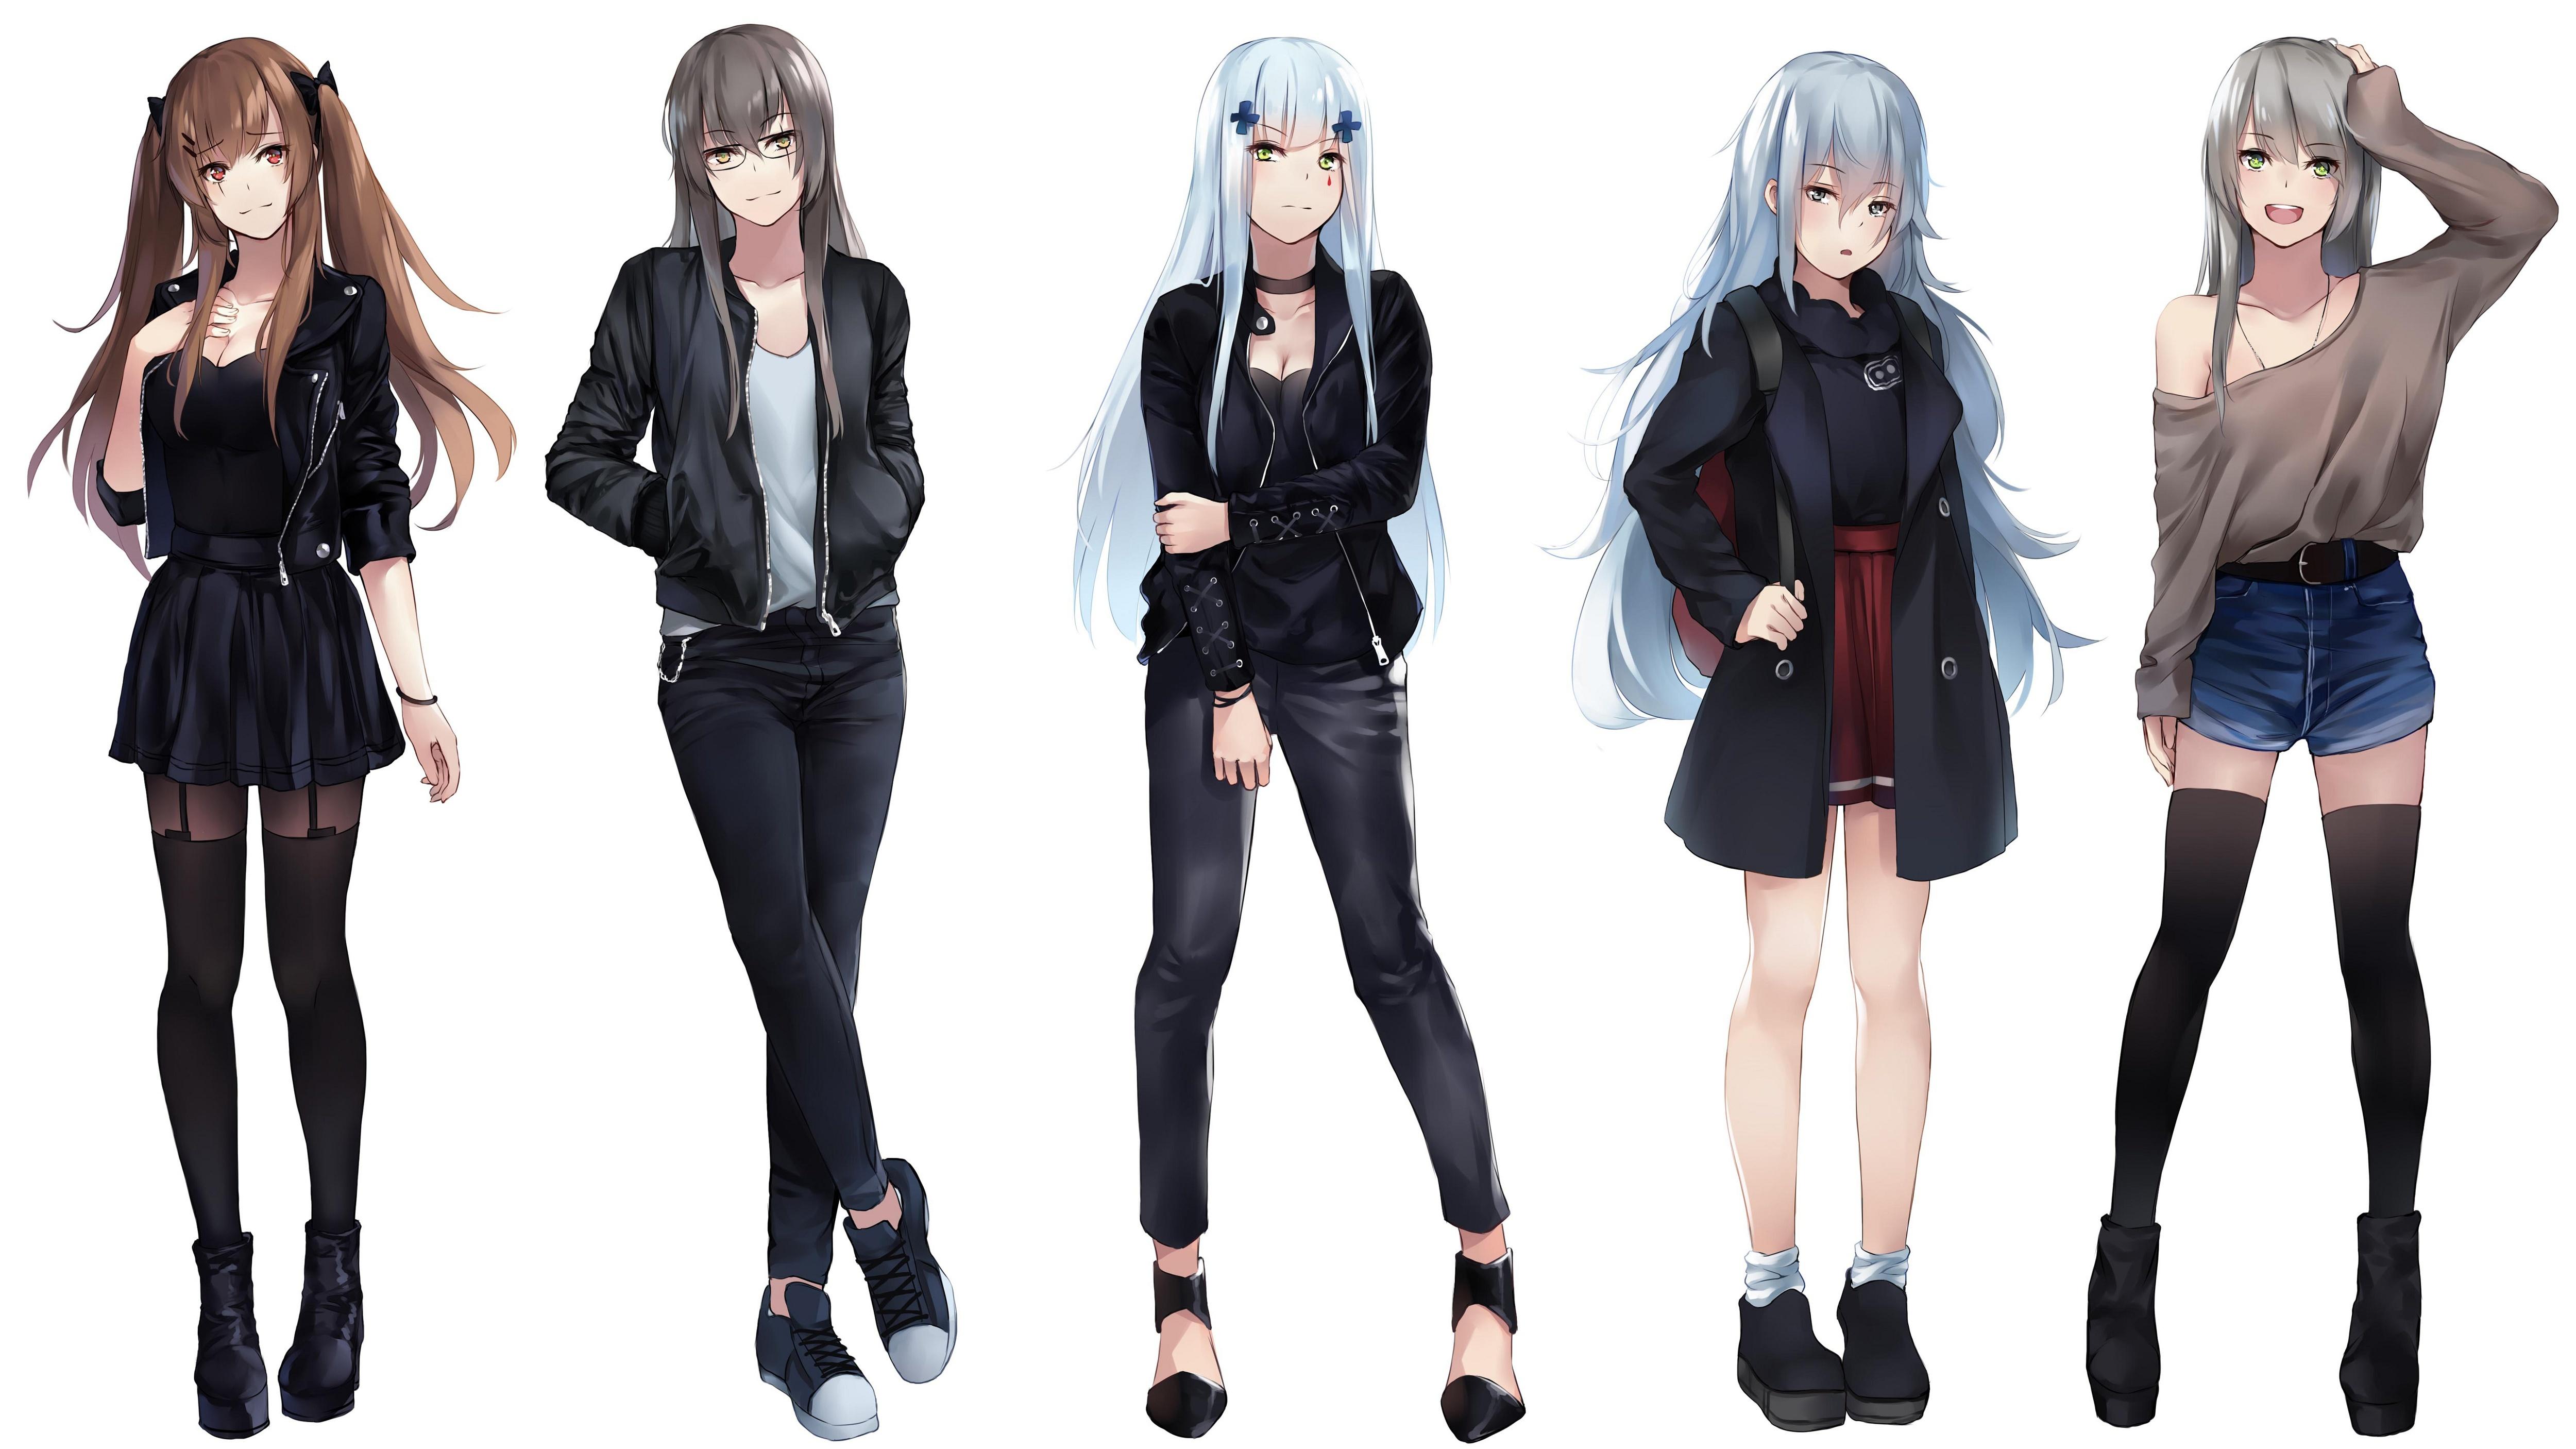 Картинка: Девушки, стиль, группа, Girls Frontline, девушки фронта, игра, аниме